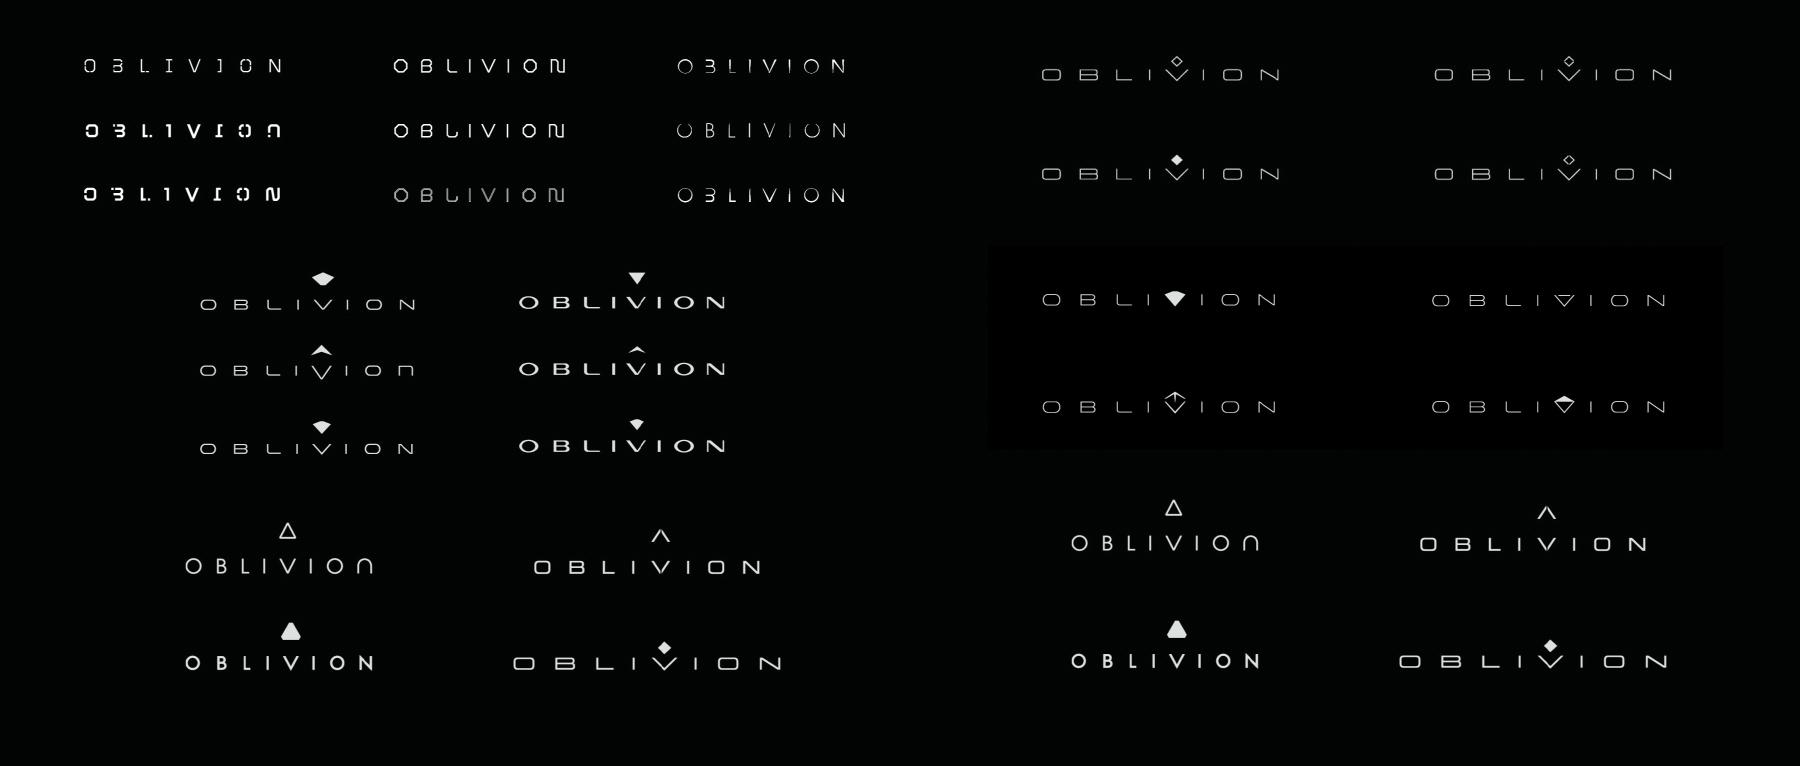 Oblivion_02_00005.jpg